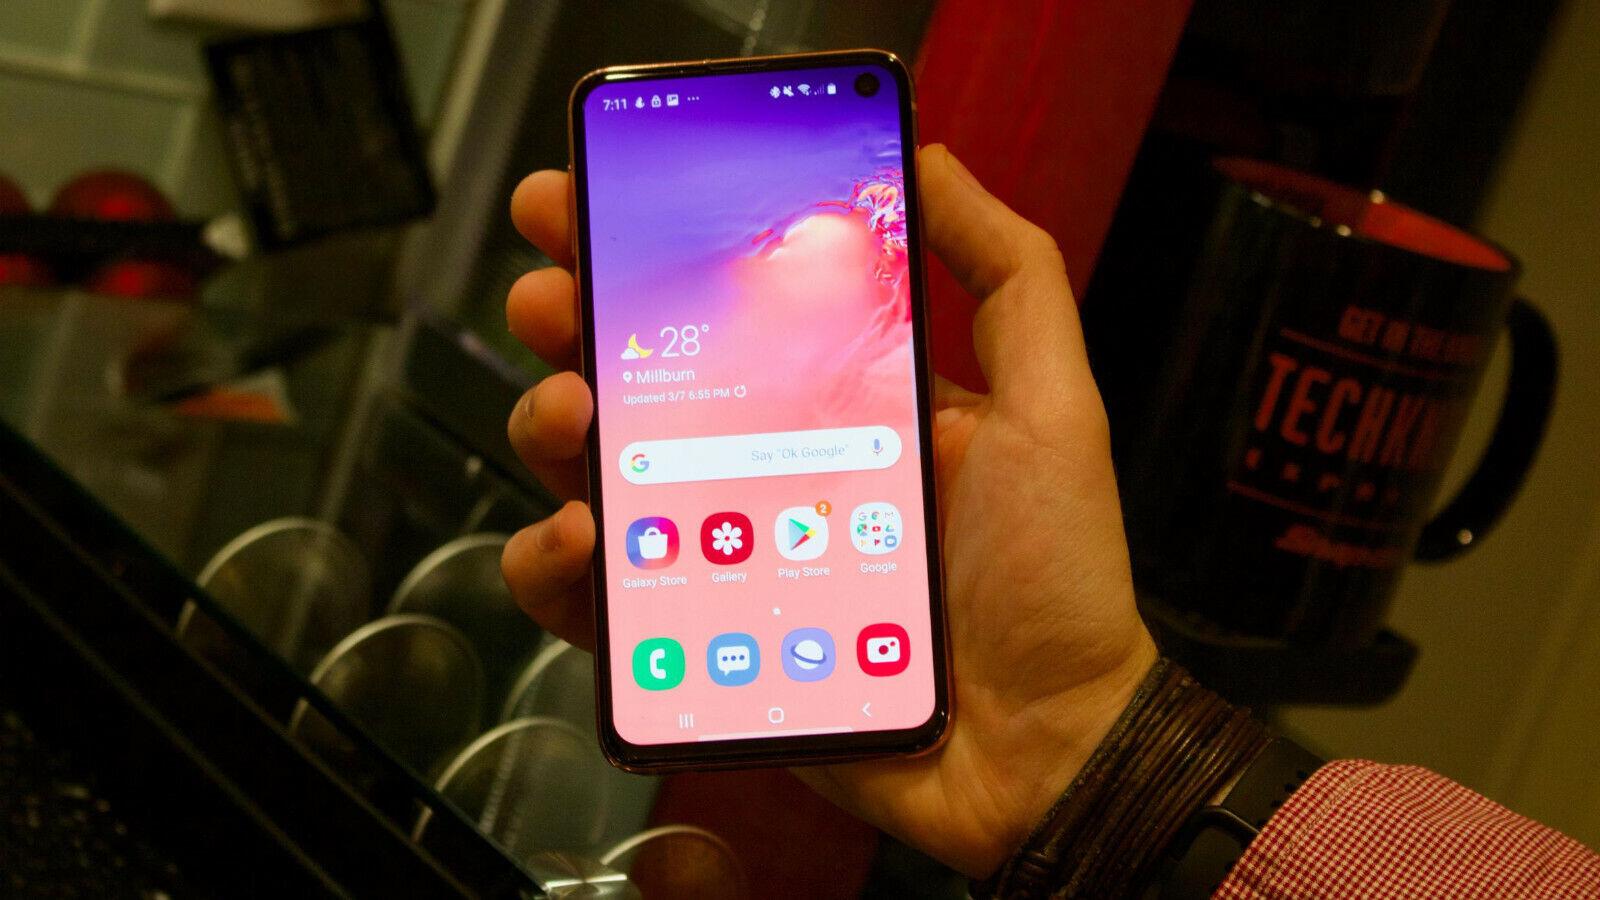 Android Phone - Samsung Galaxy S10e SM-G970F - 128GB - Prism White (Unlocked) (Single SIM)